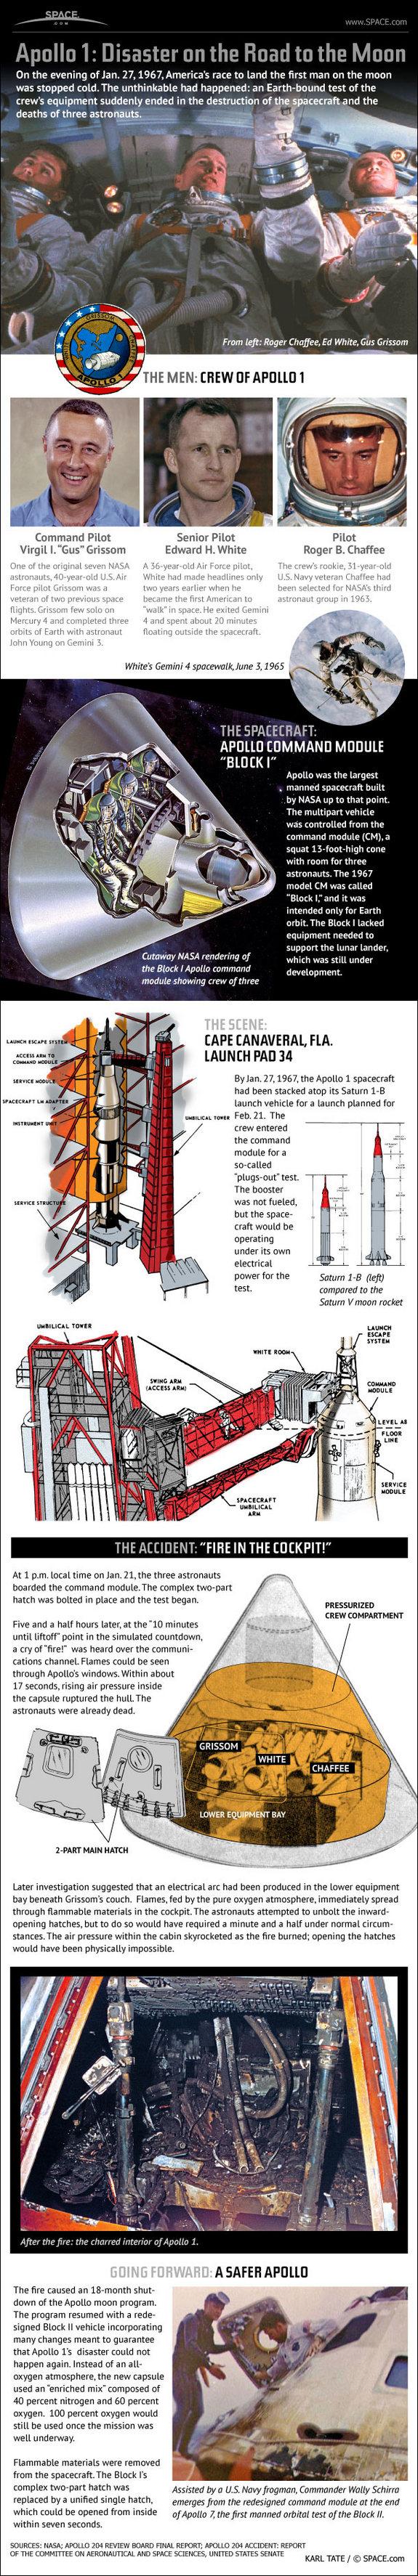 apollo-one-fire-disaster-anniversary-120126b-02